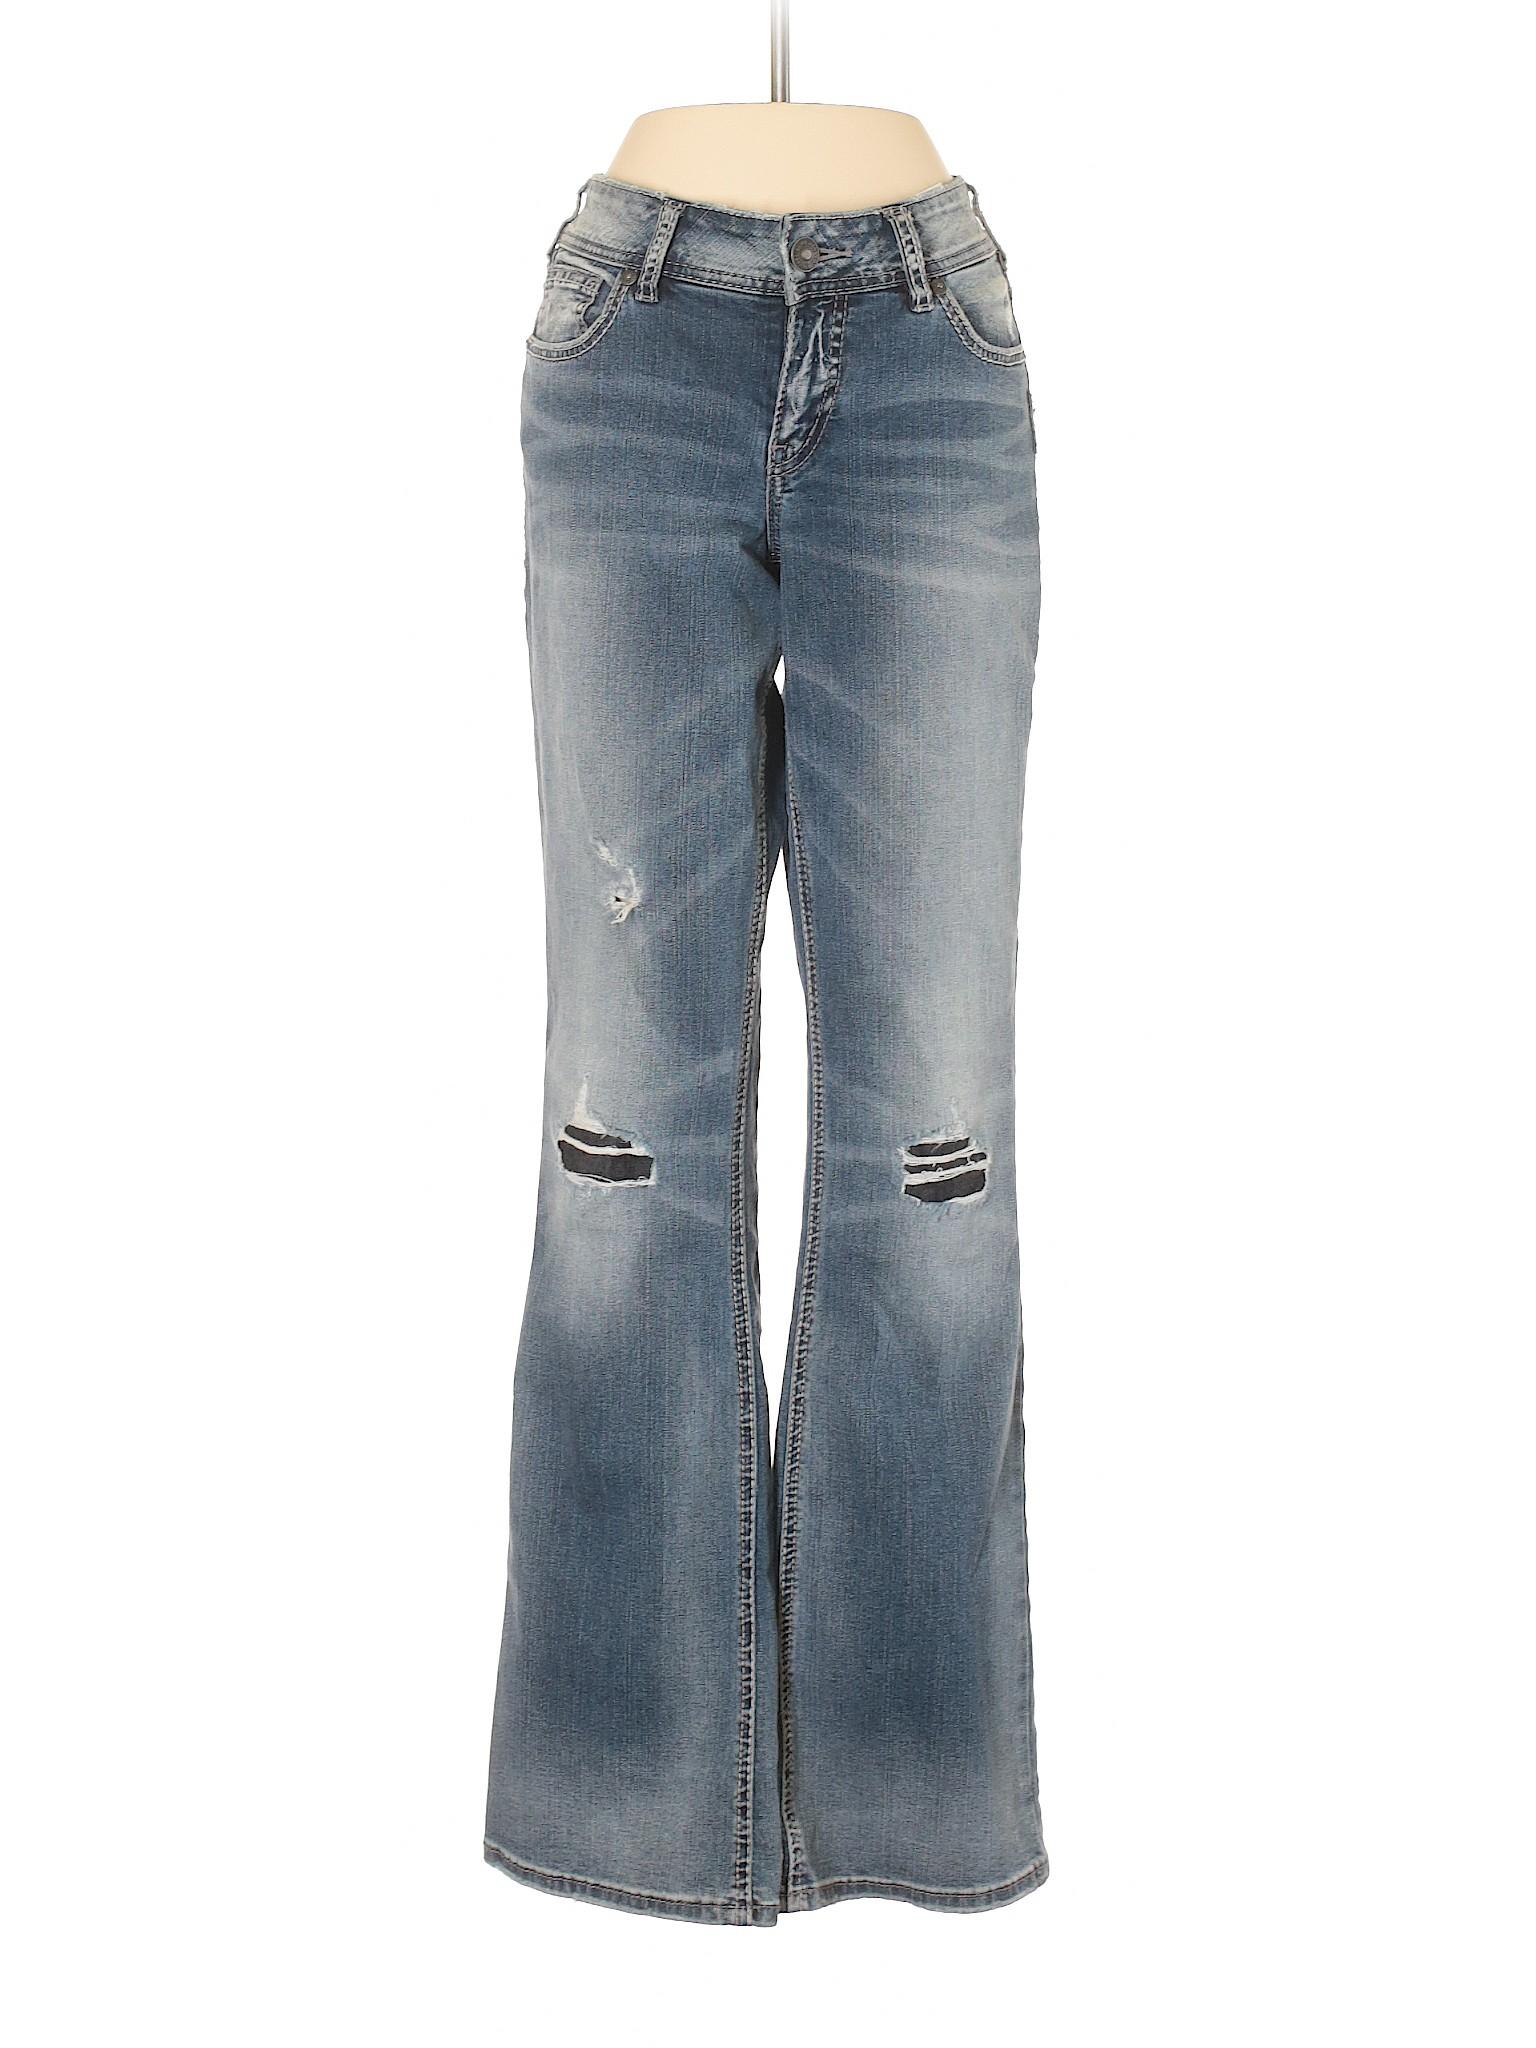 Silver Promotion Jeans Silver Promotion Silver XQXl6p3v3Q Promotion Jeans XQXl6p3v3Q Promotion XQXl6p3v3Q Jeans qOBwwcIY7